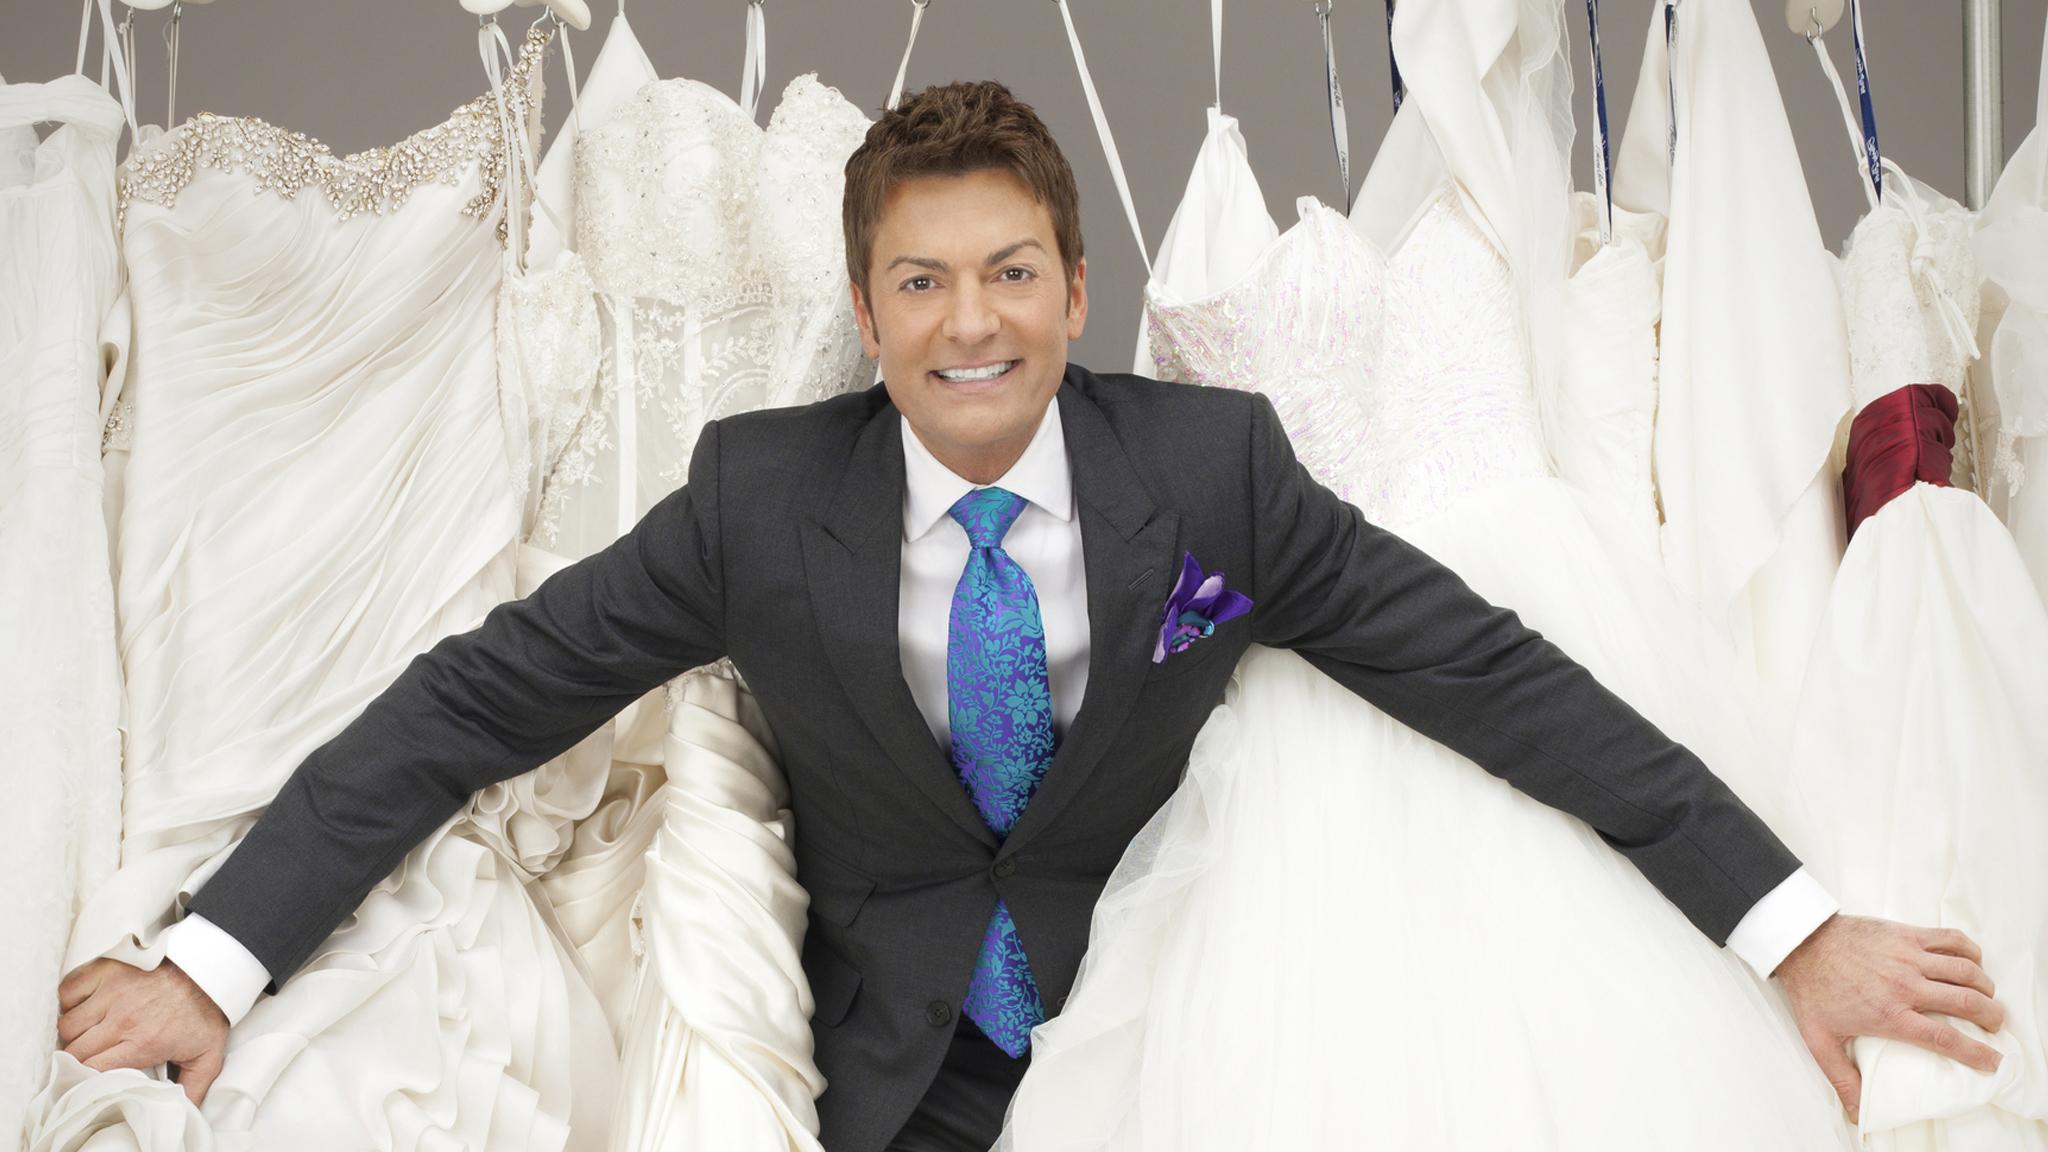 Ver programa vestido de novia online